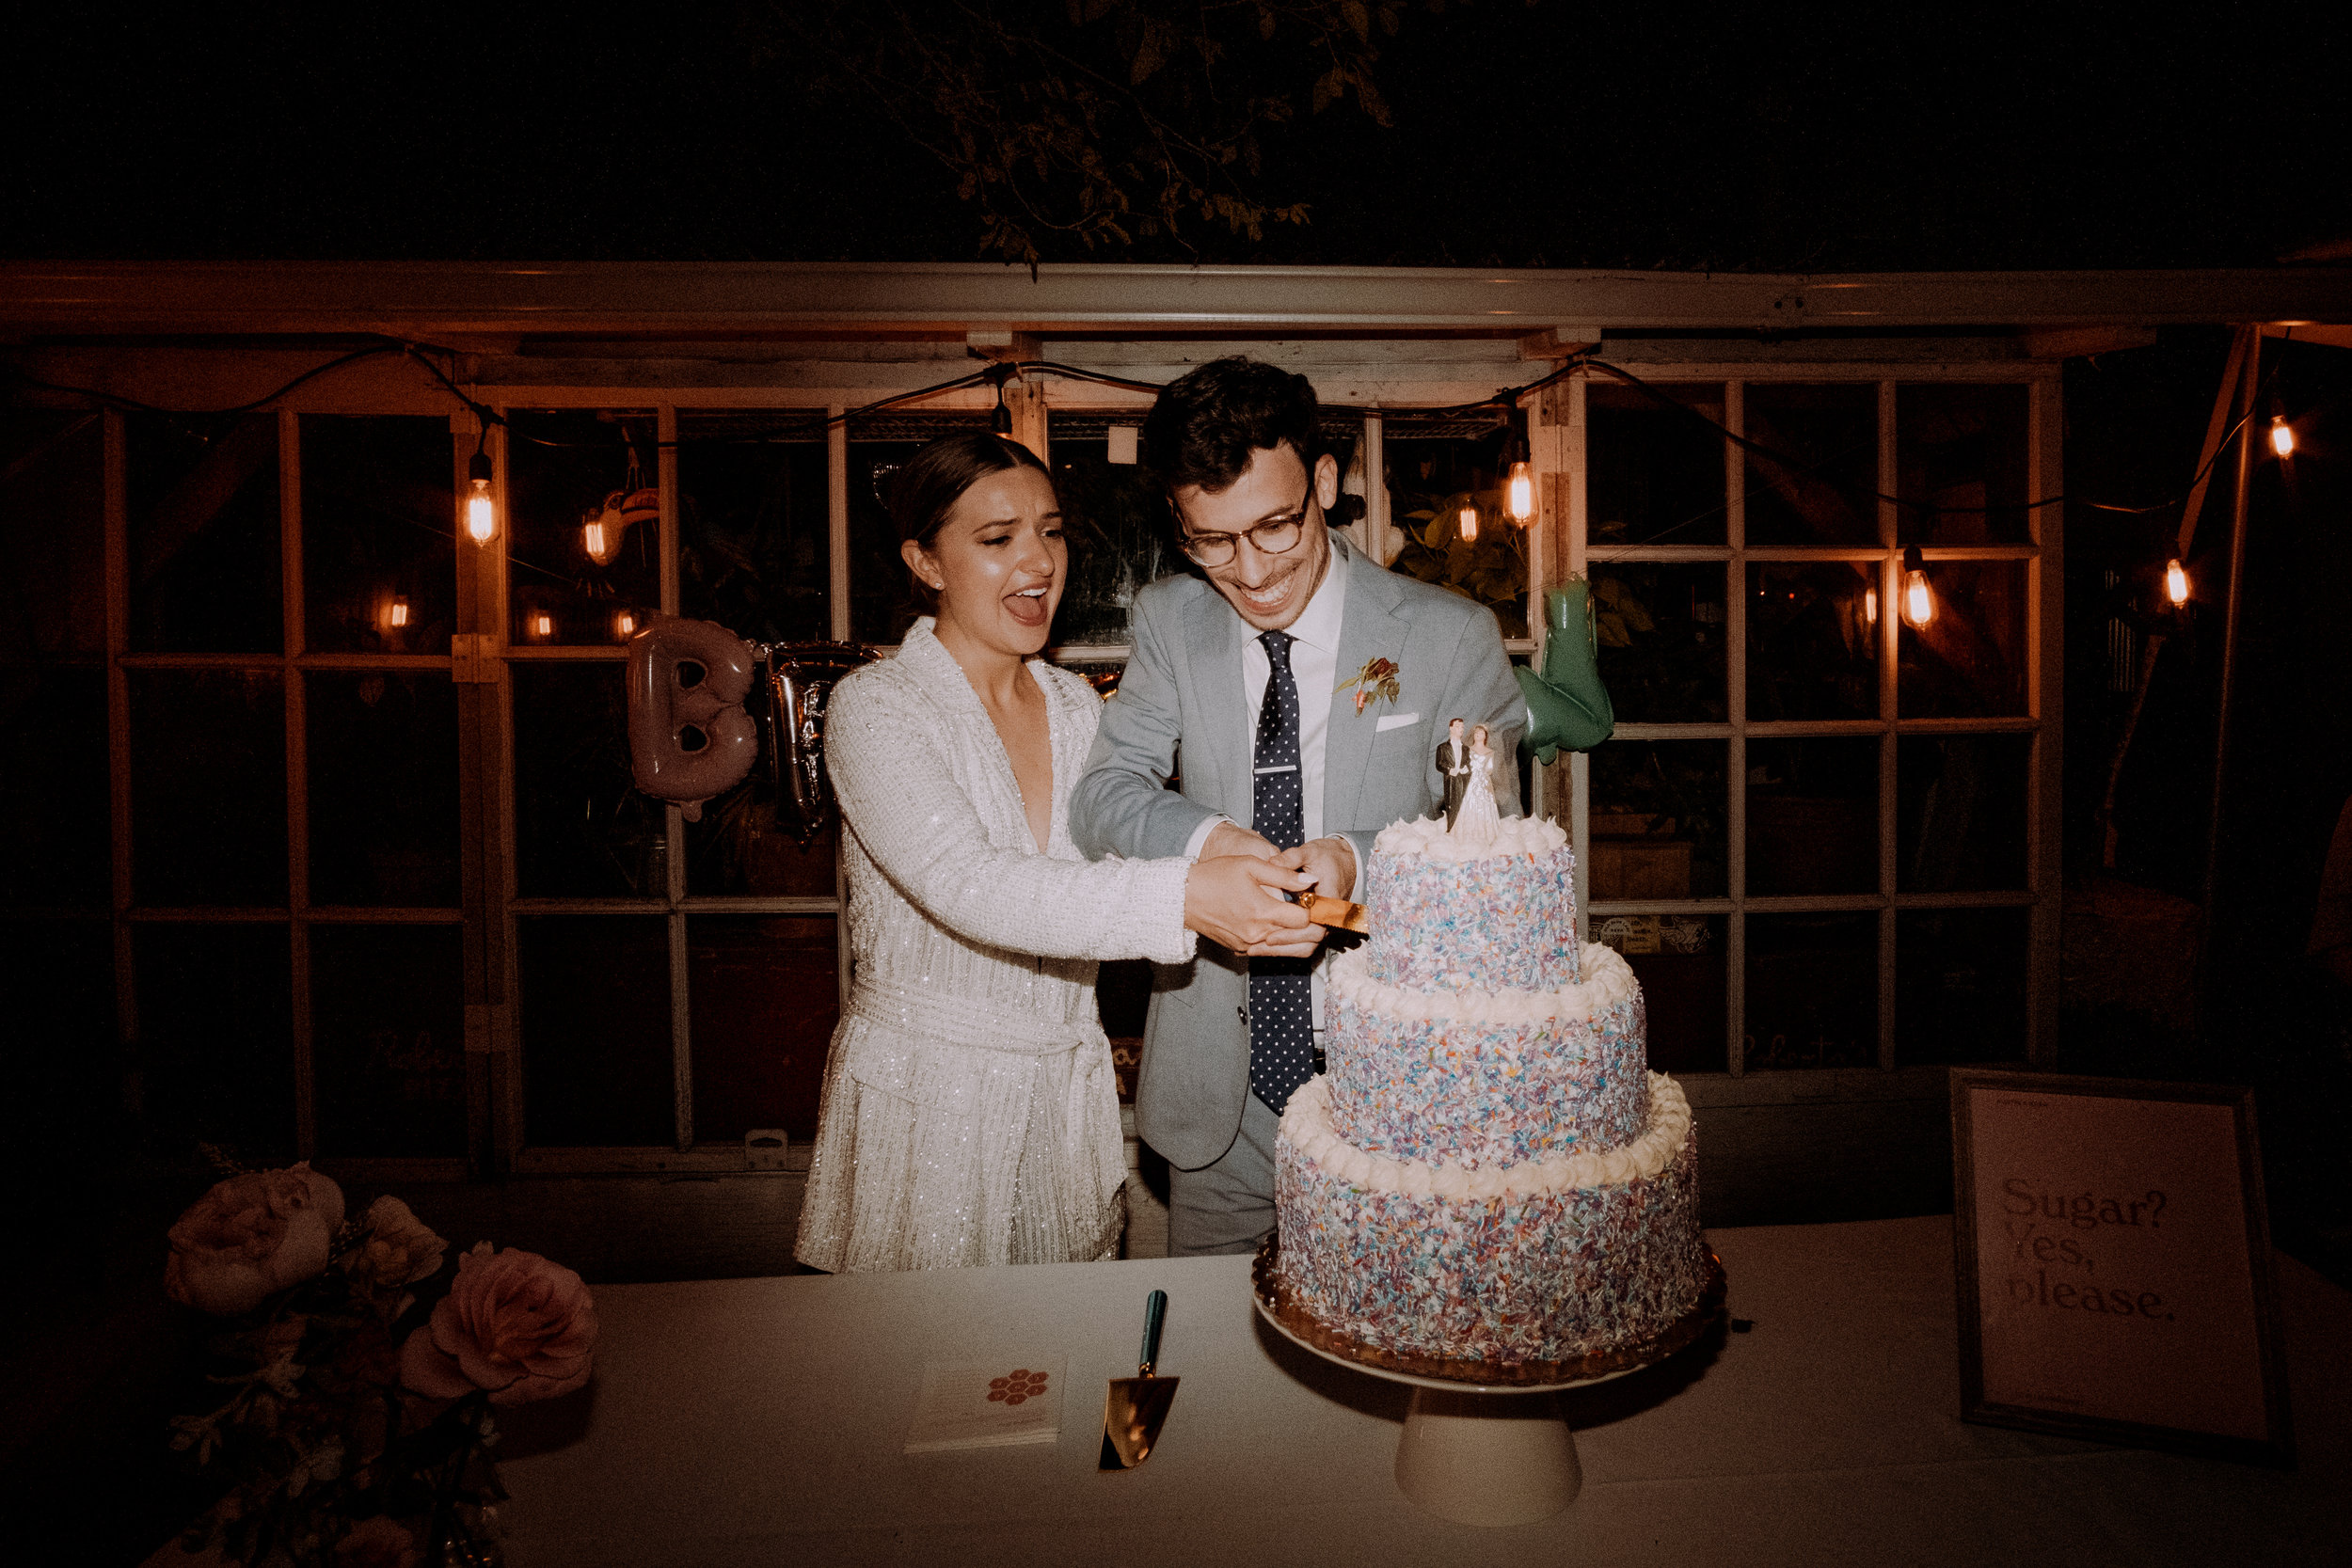 Chellise_Michael_Photography_Robertas_Brooklyn_Wedding_Photographer-824.jpg